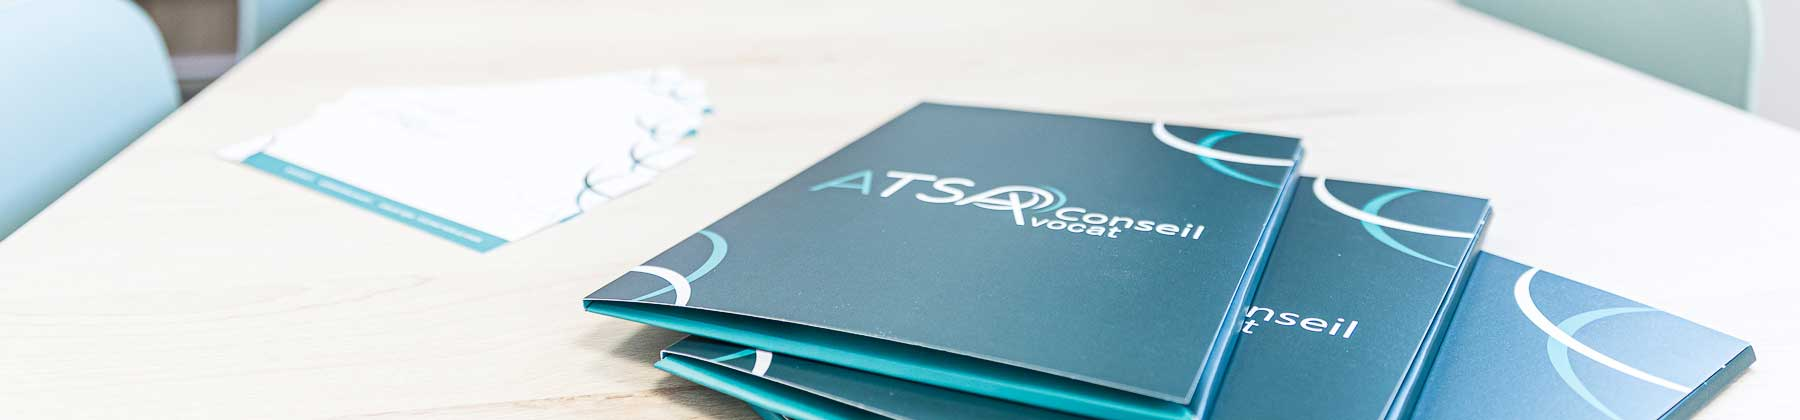 Dossier Atsa Conseil Avocat